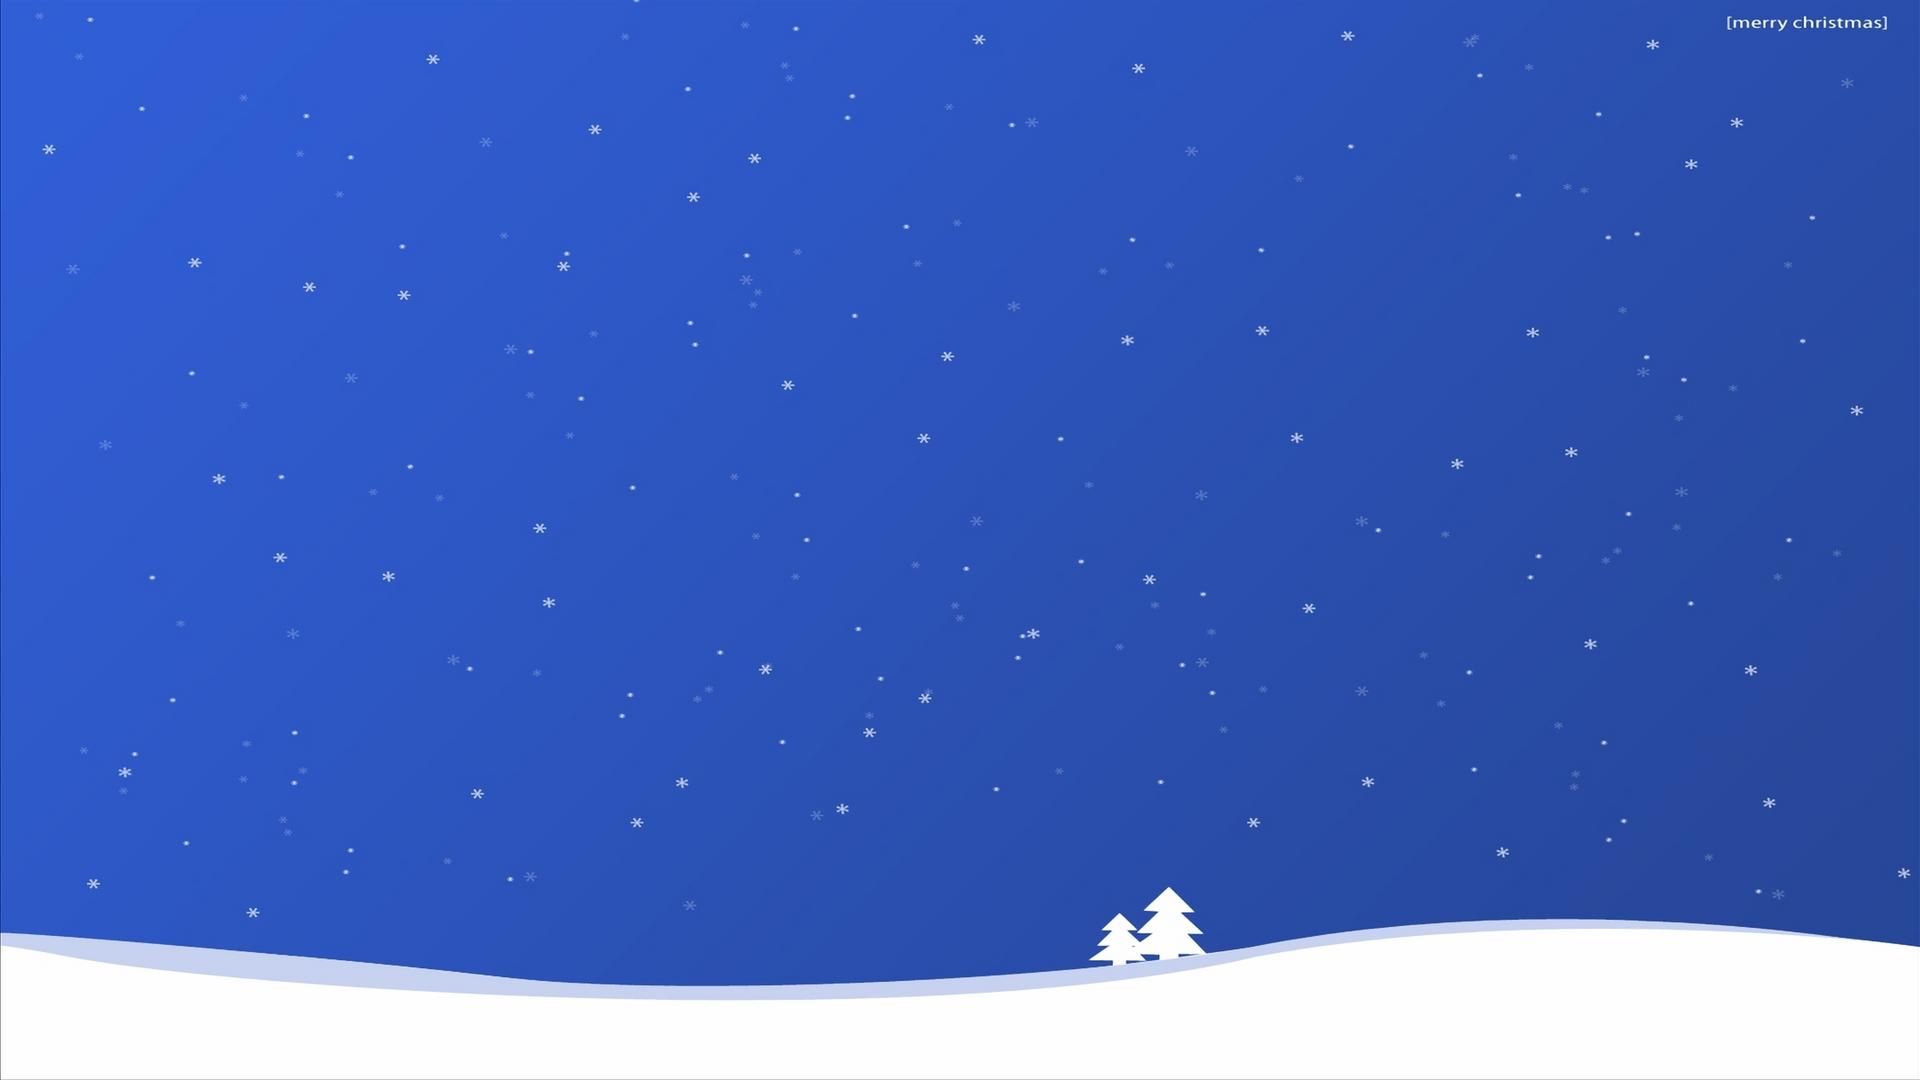 43 Christmas Wallpapers For Desktop 1920x1080 On